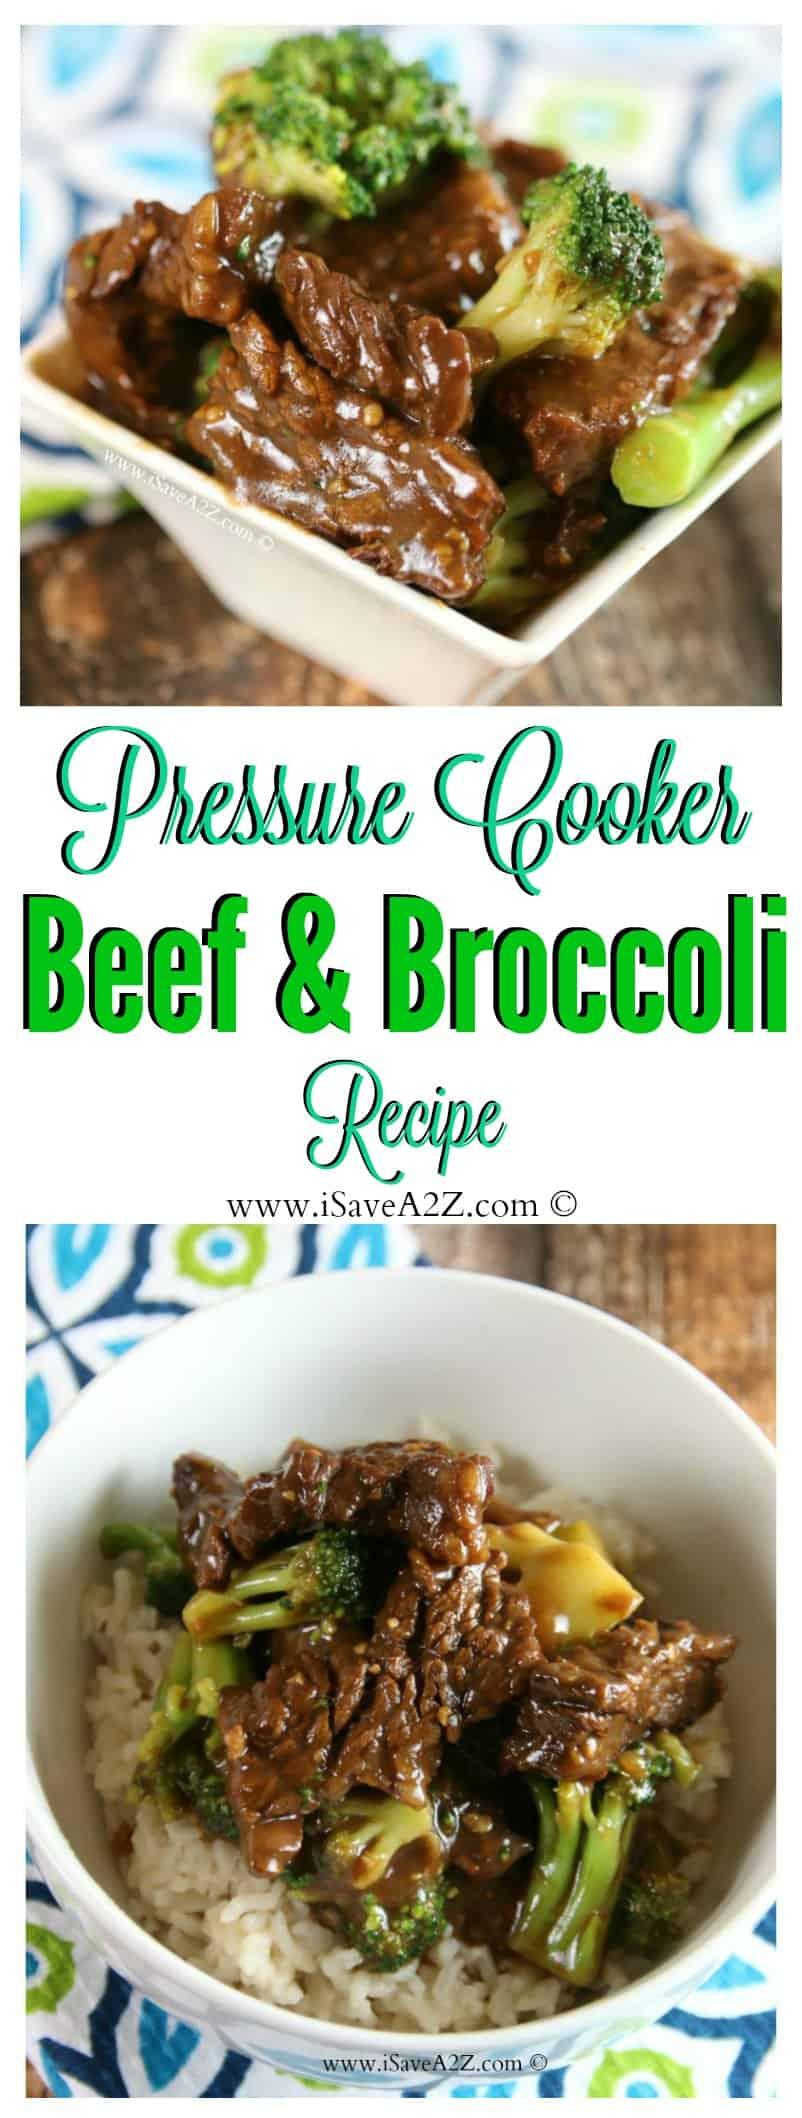 Easy Pressure Cooker Beef and Broccoli Recipe